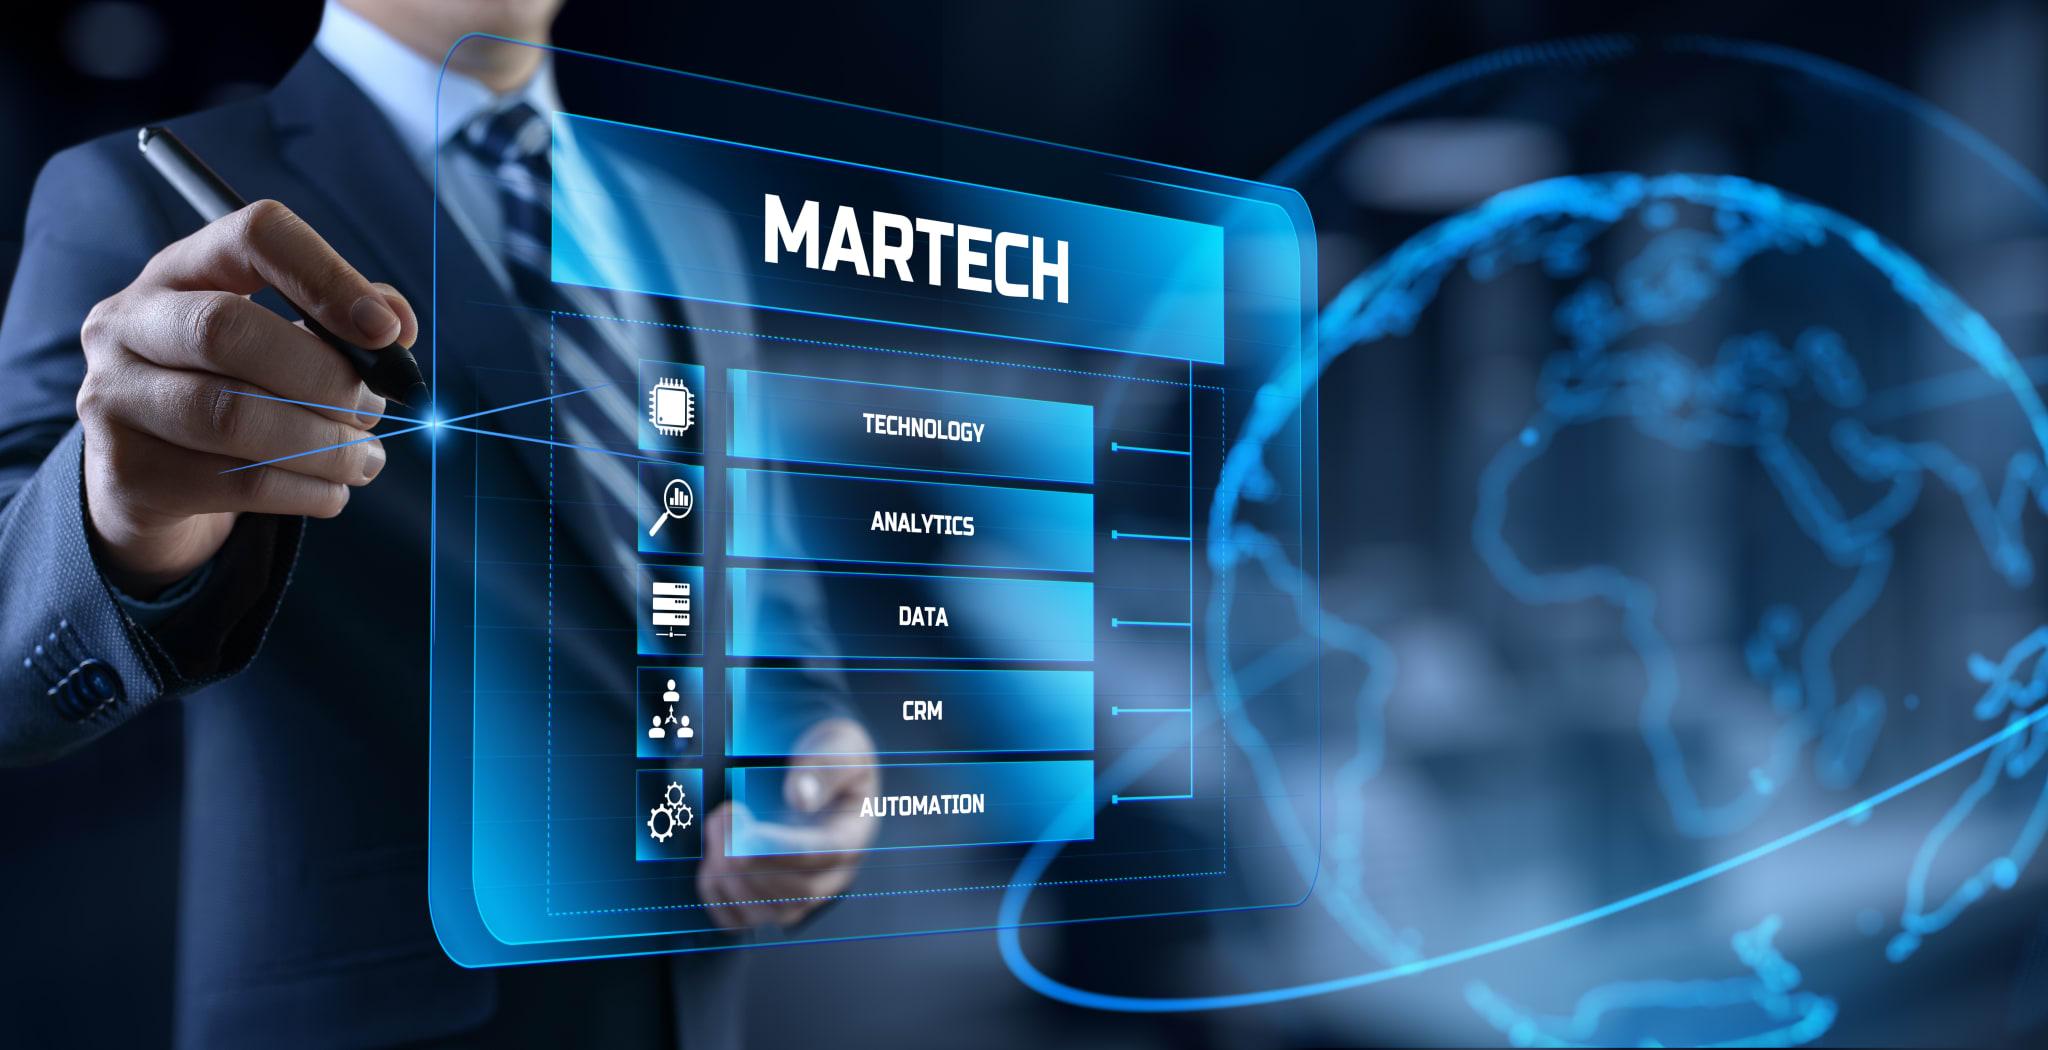 Martech marketing technology concept on virtual screen interface